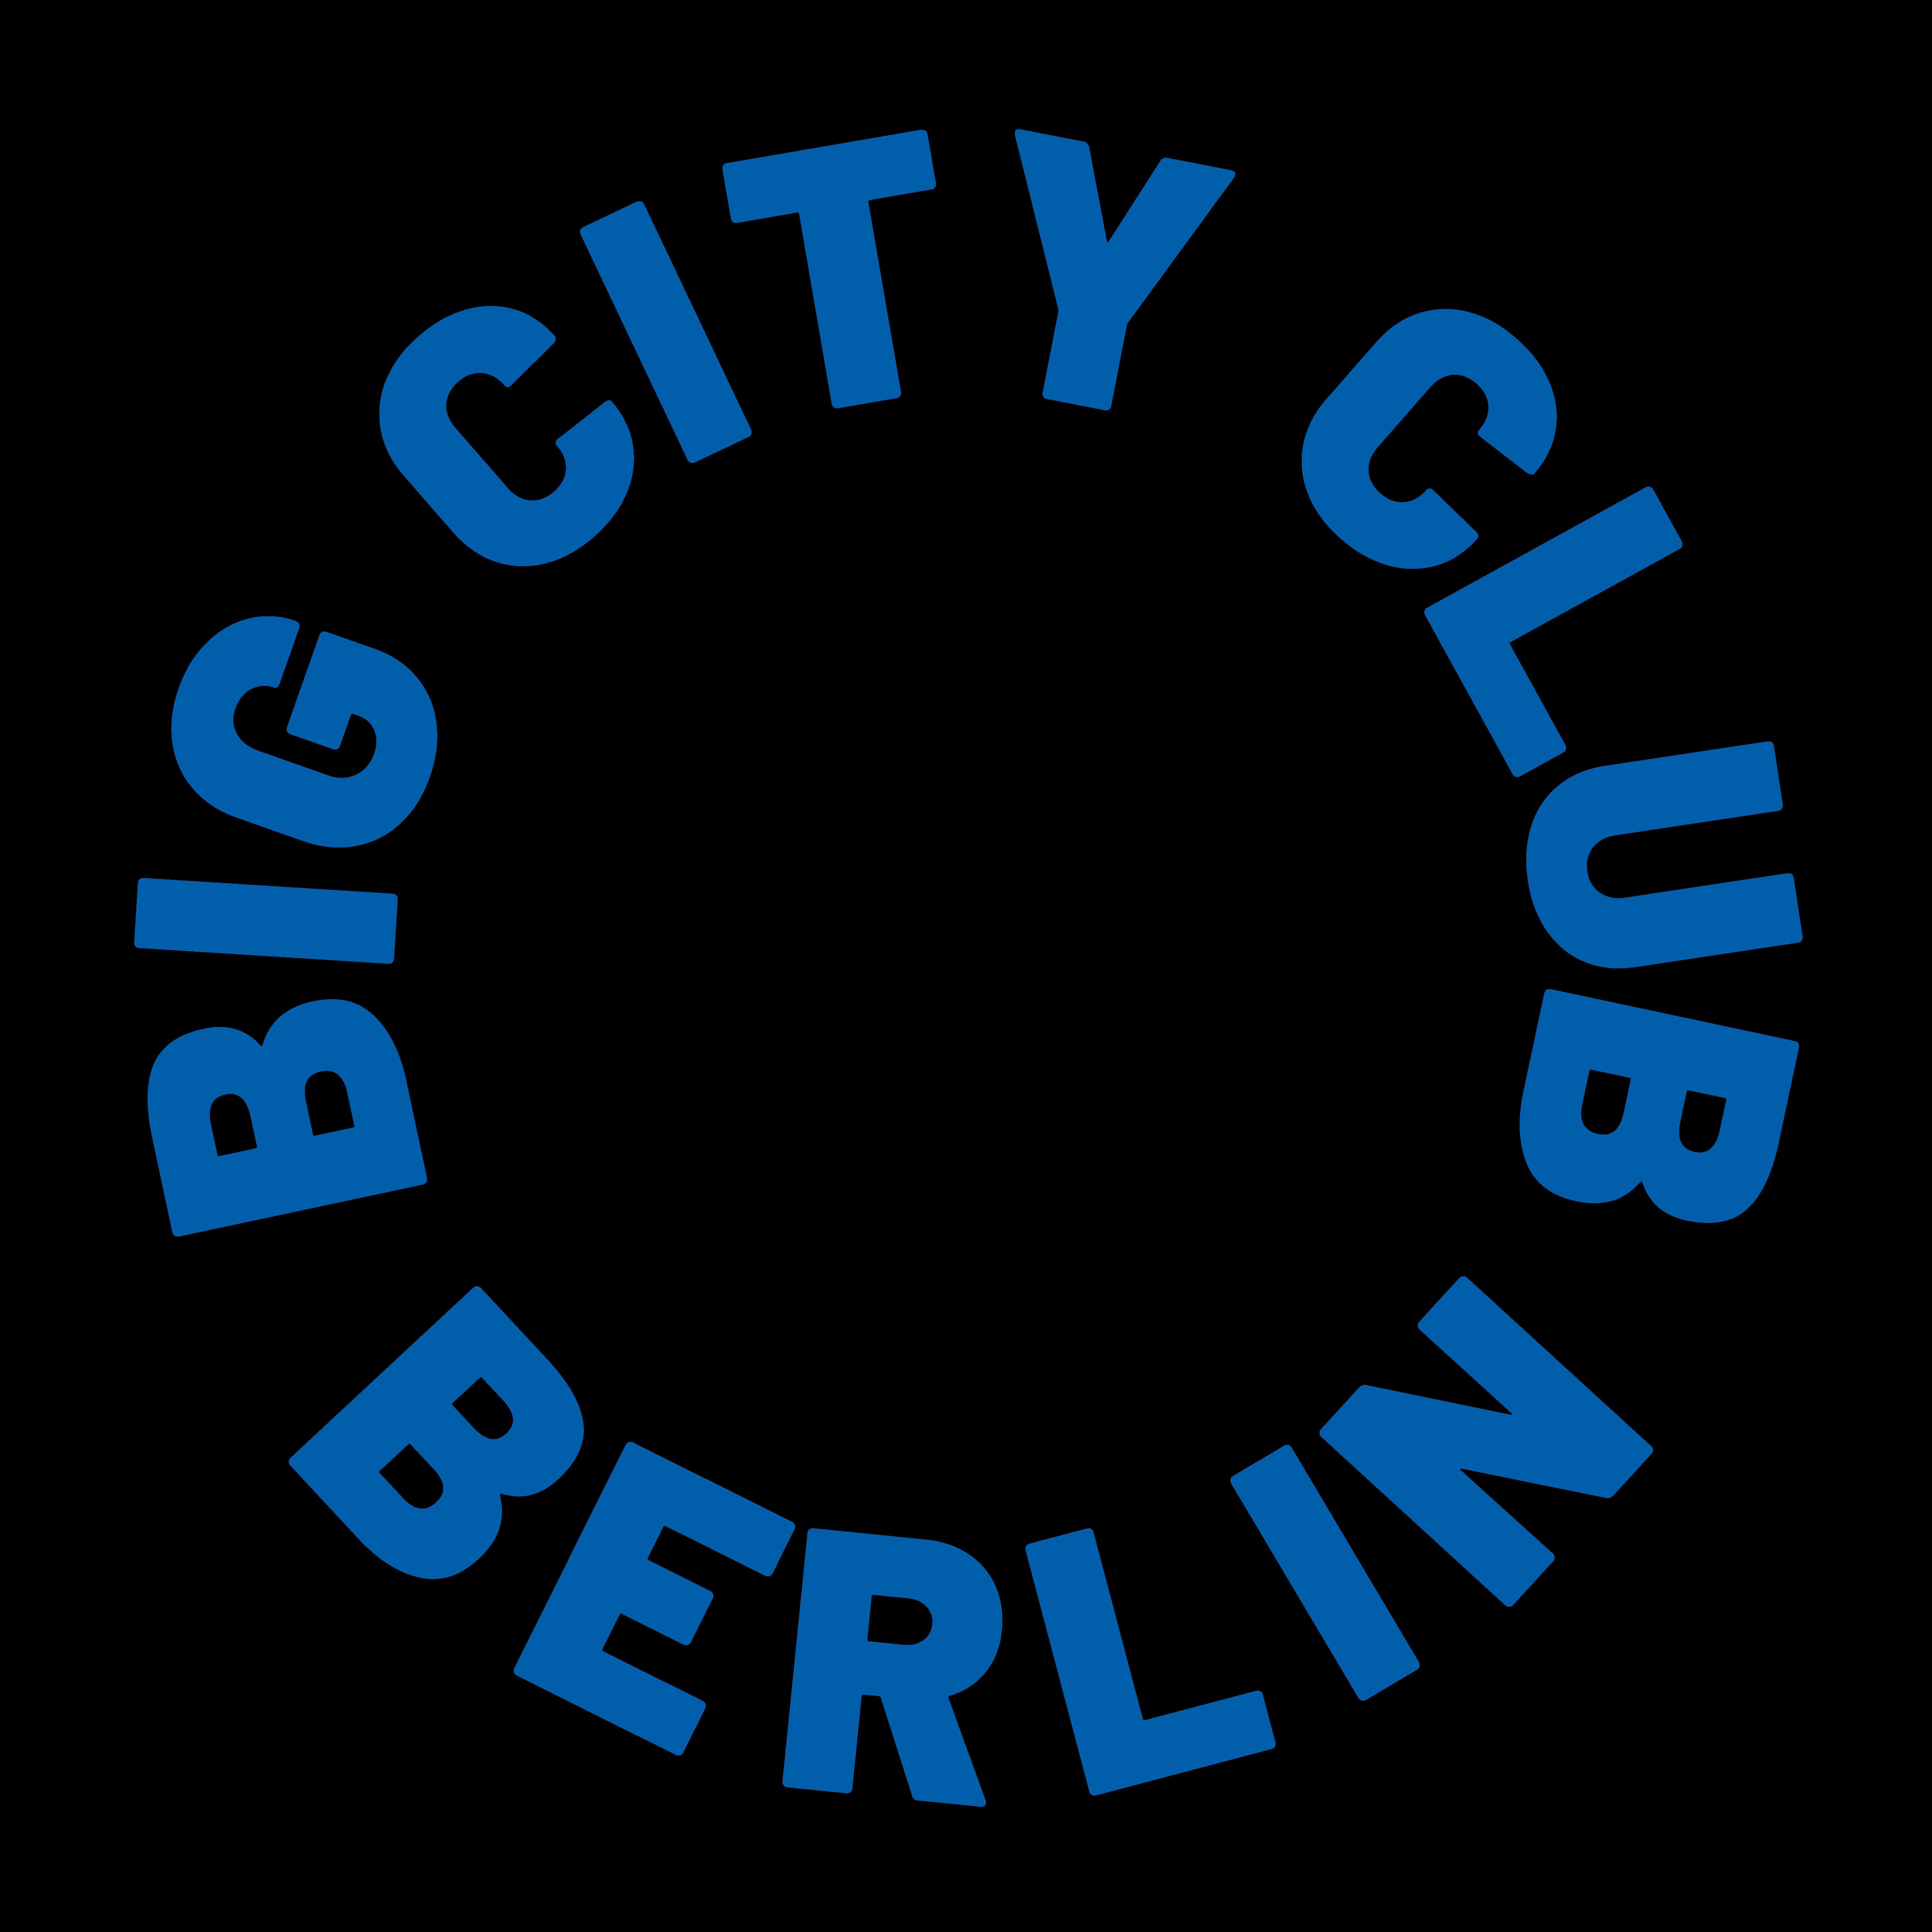 Big City Club